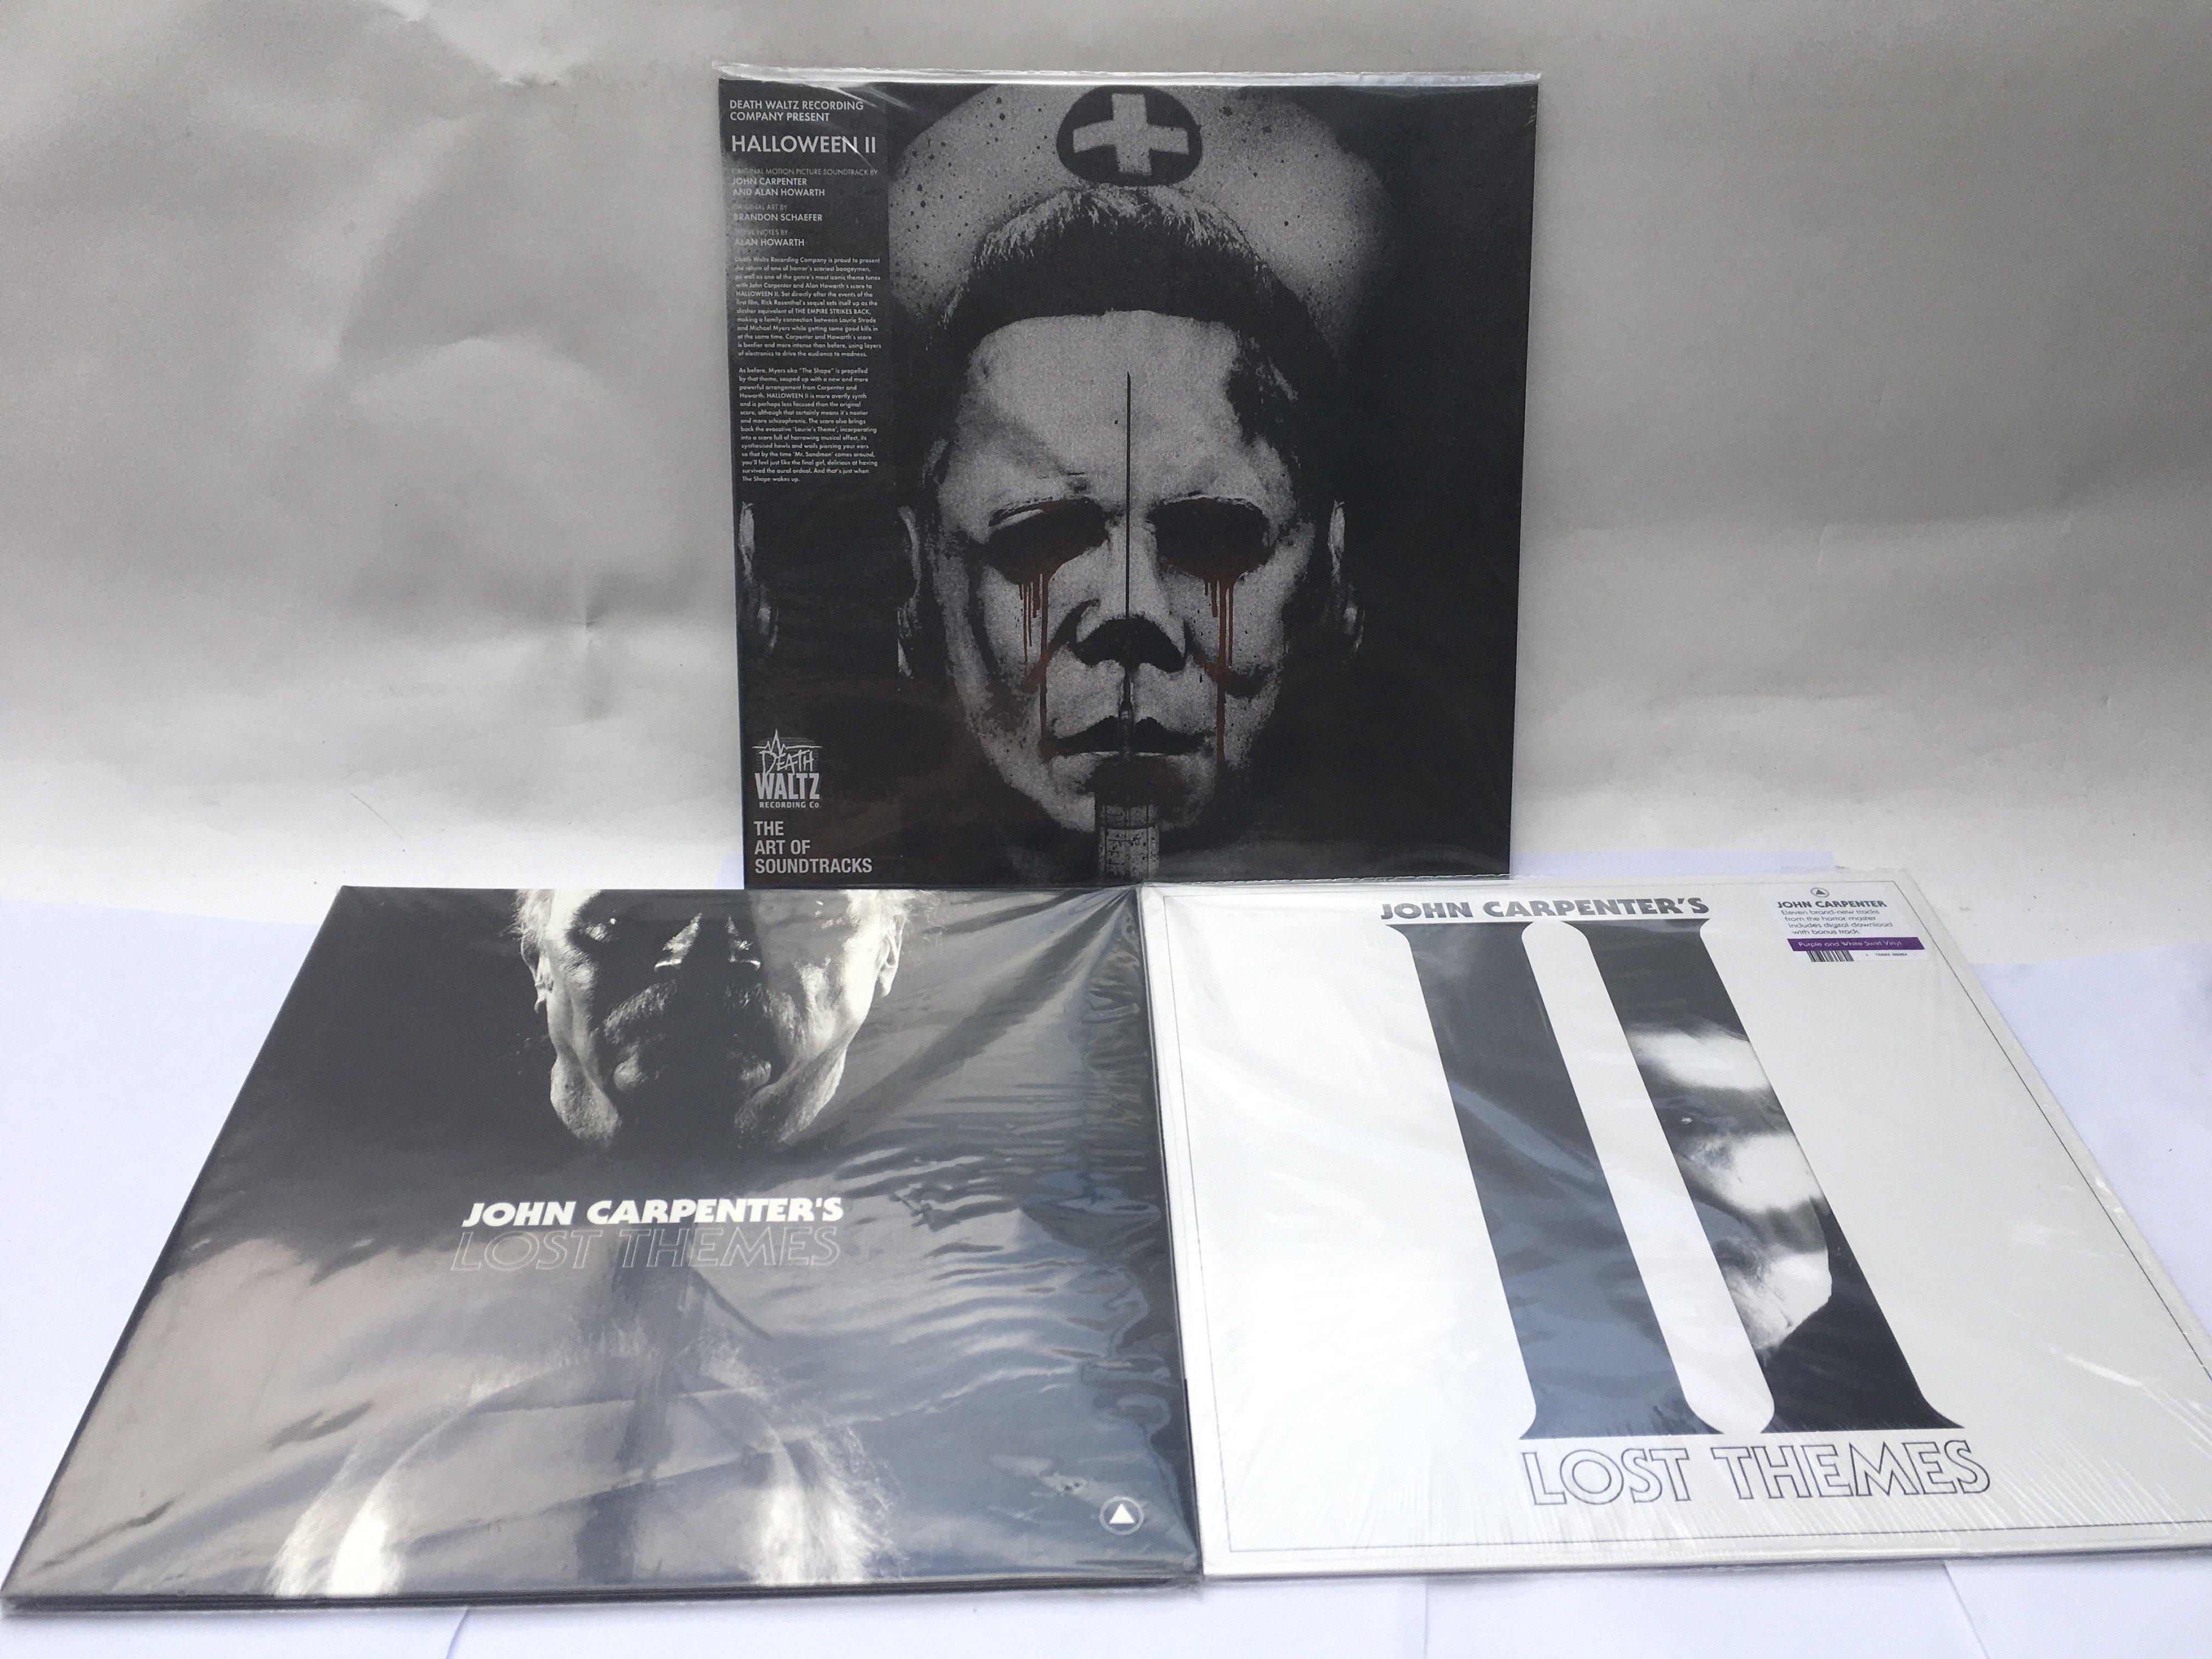 Three 180g John Carpenter soundtrack LPs comprisin